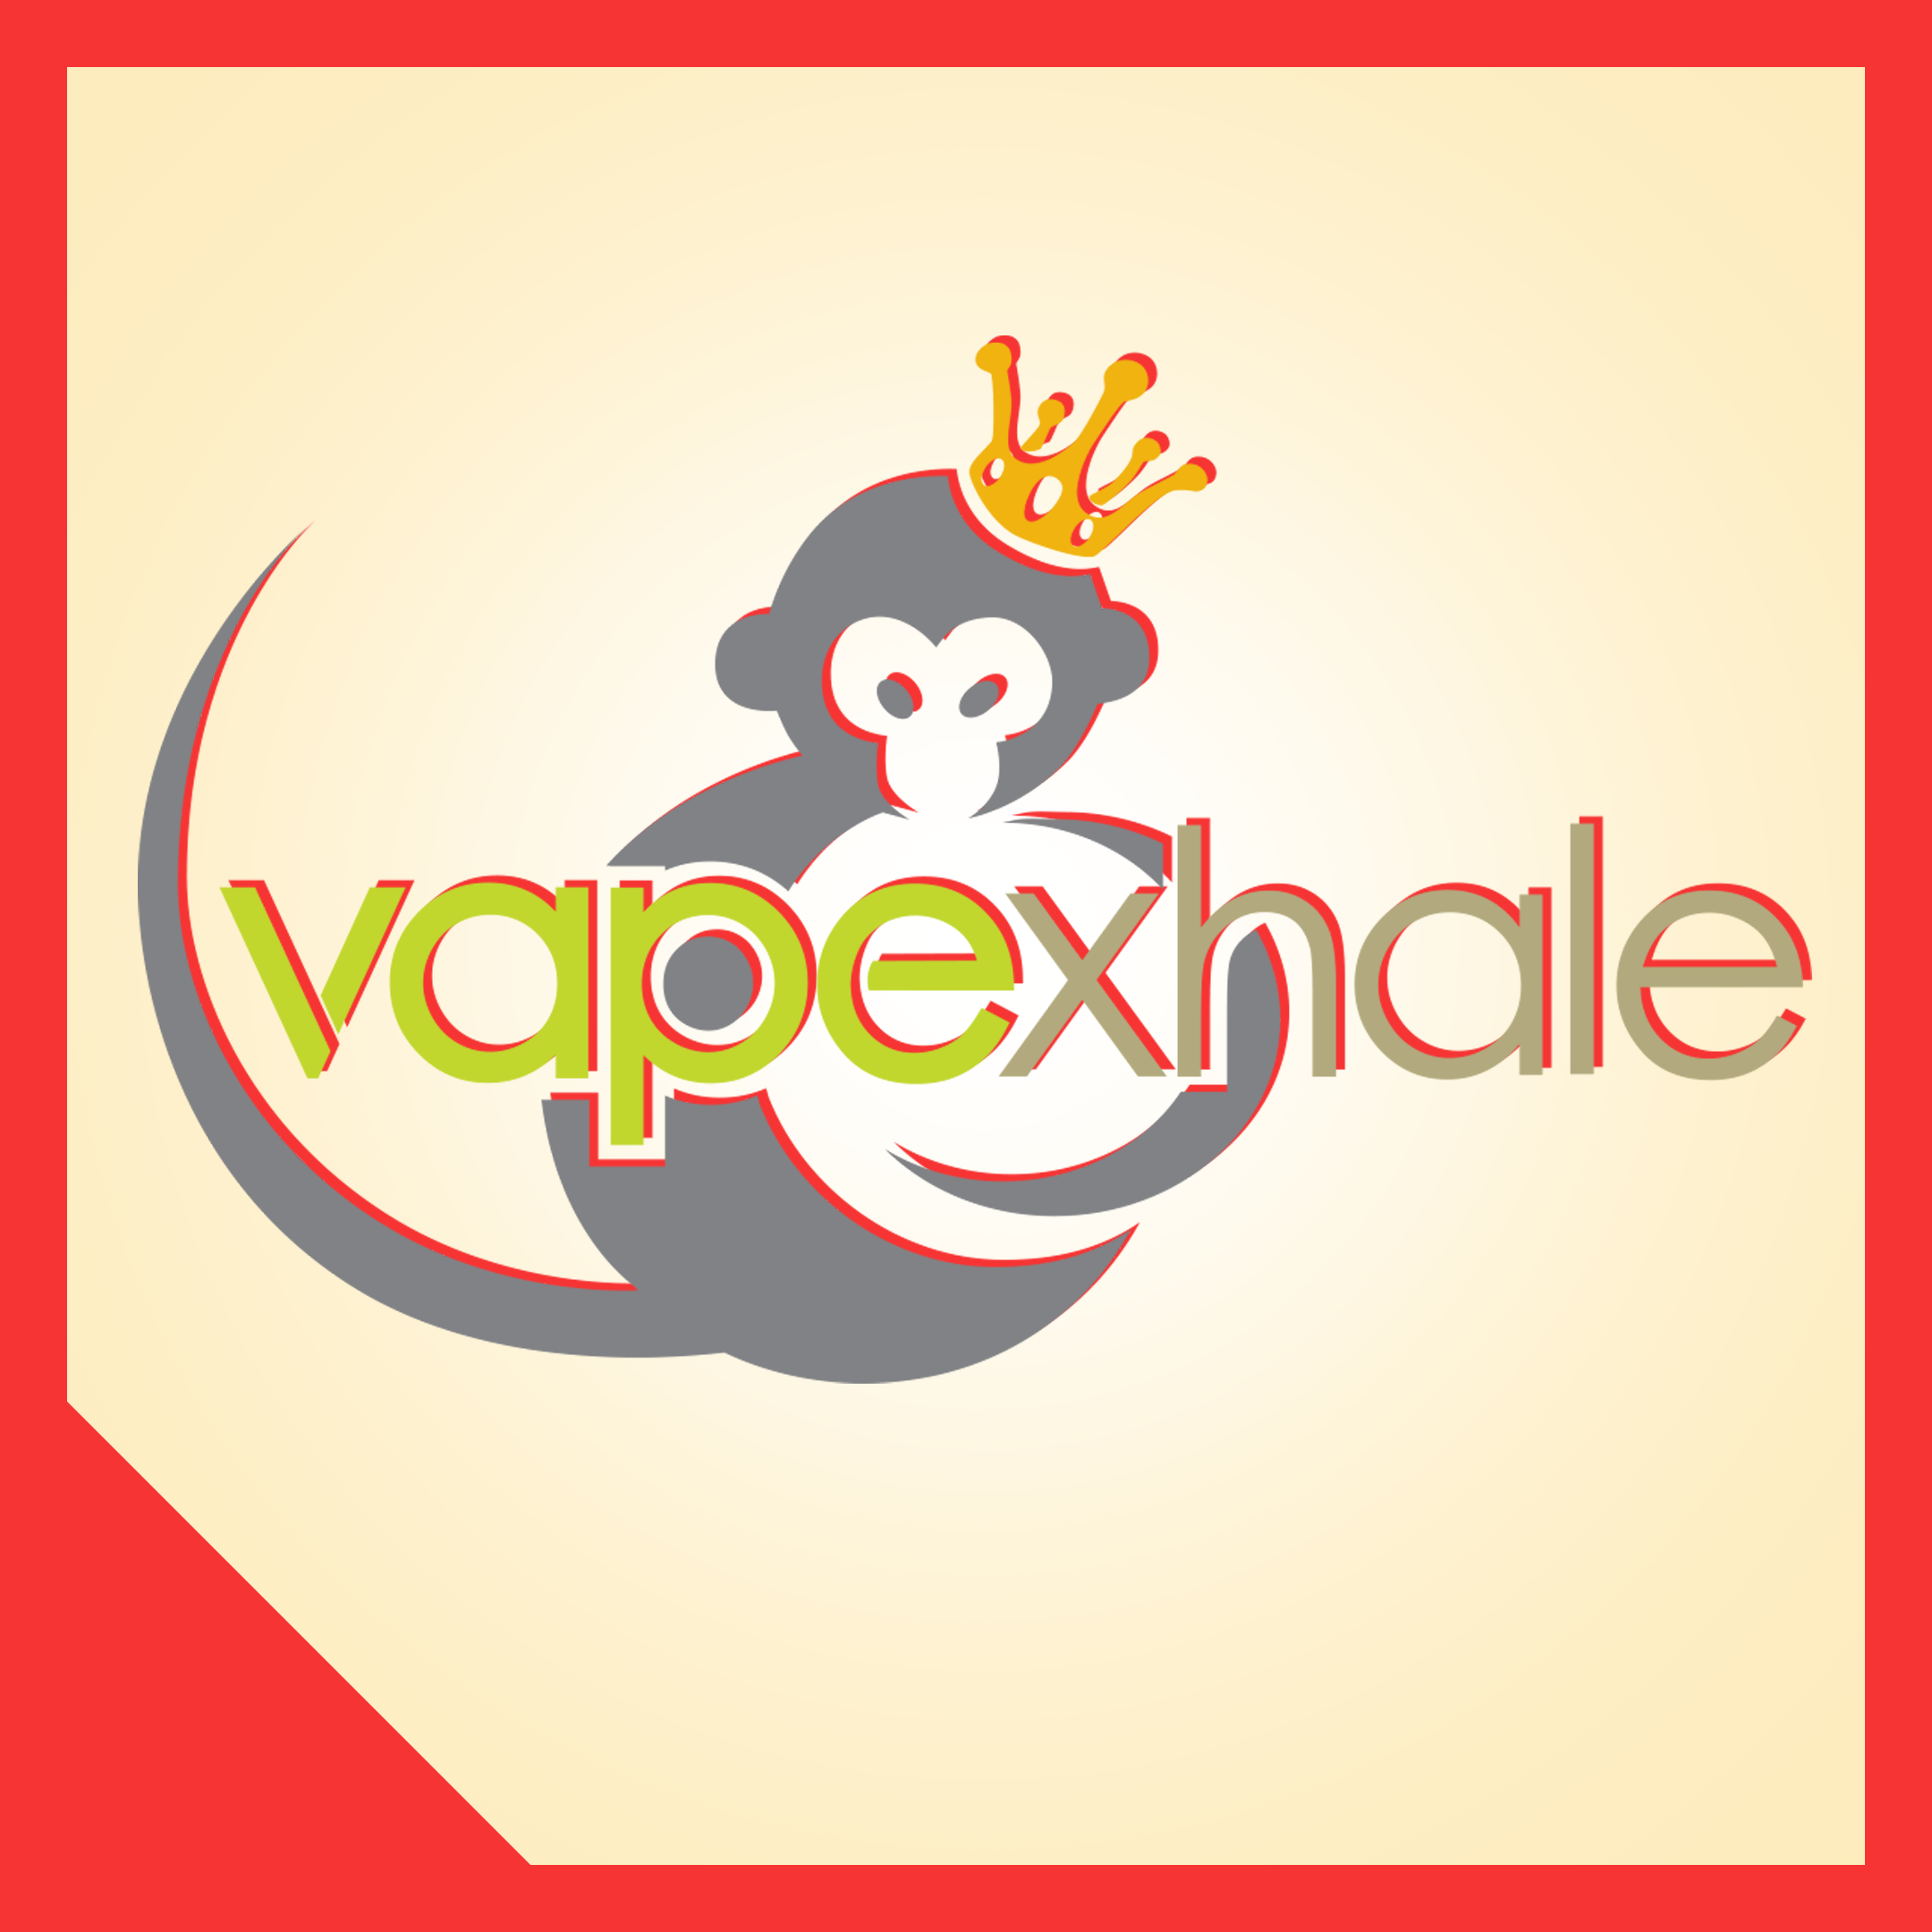 Team Vapexhale